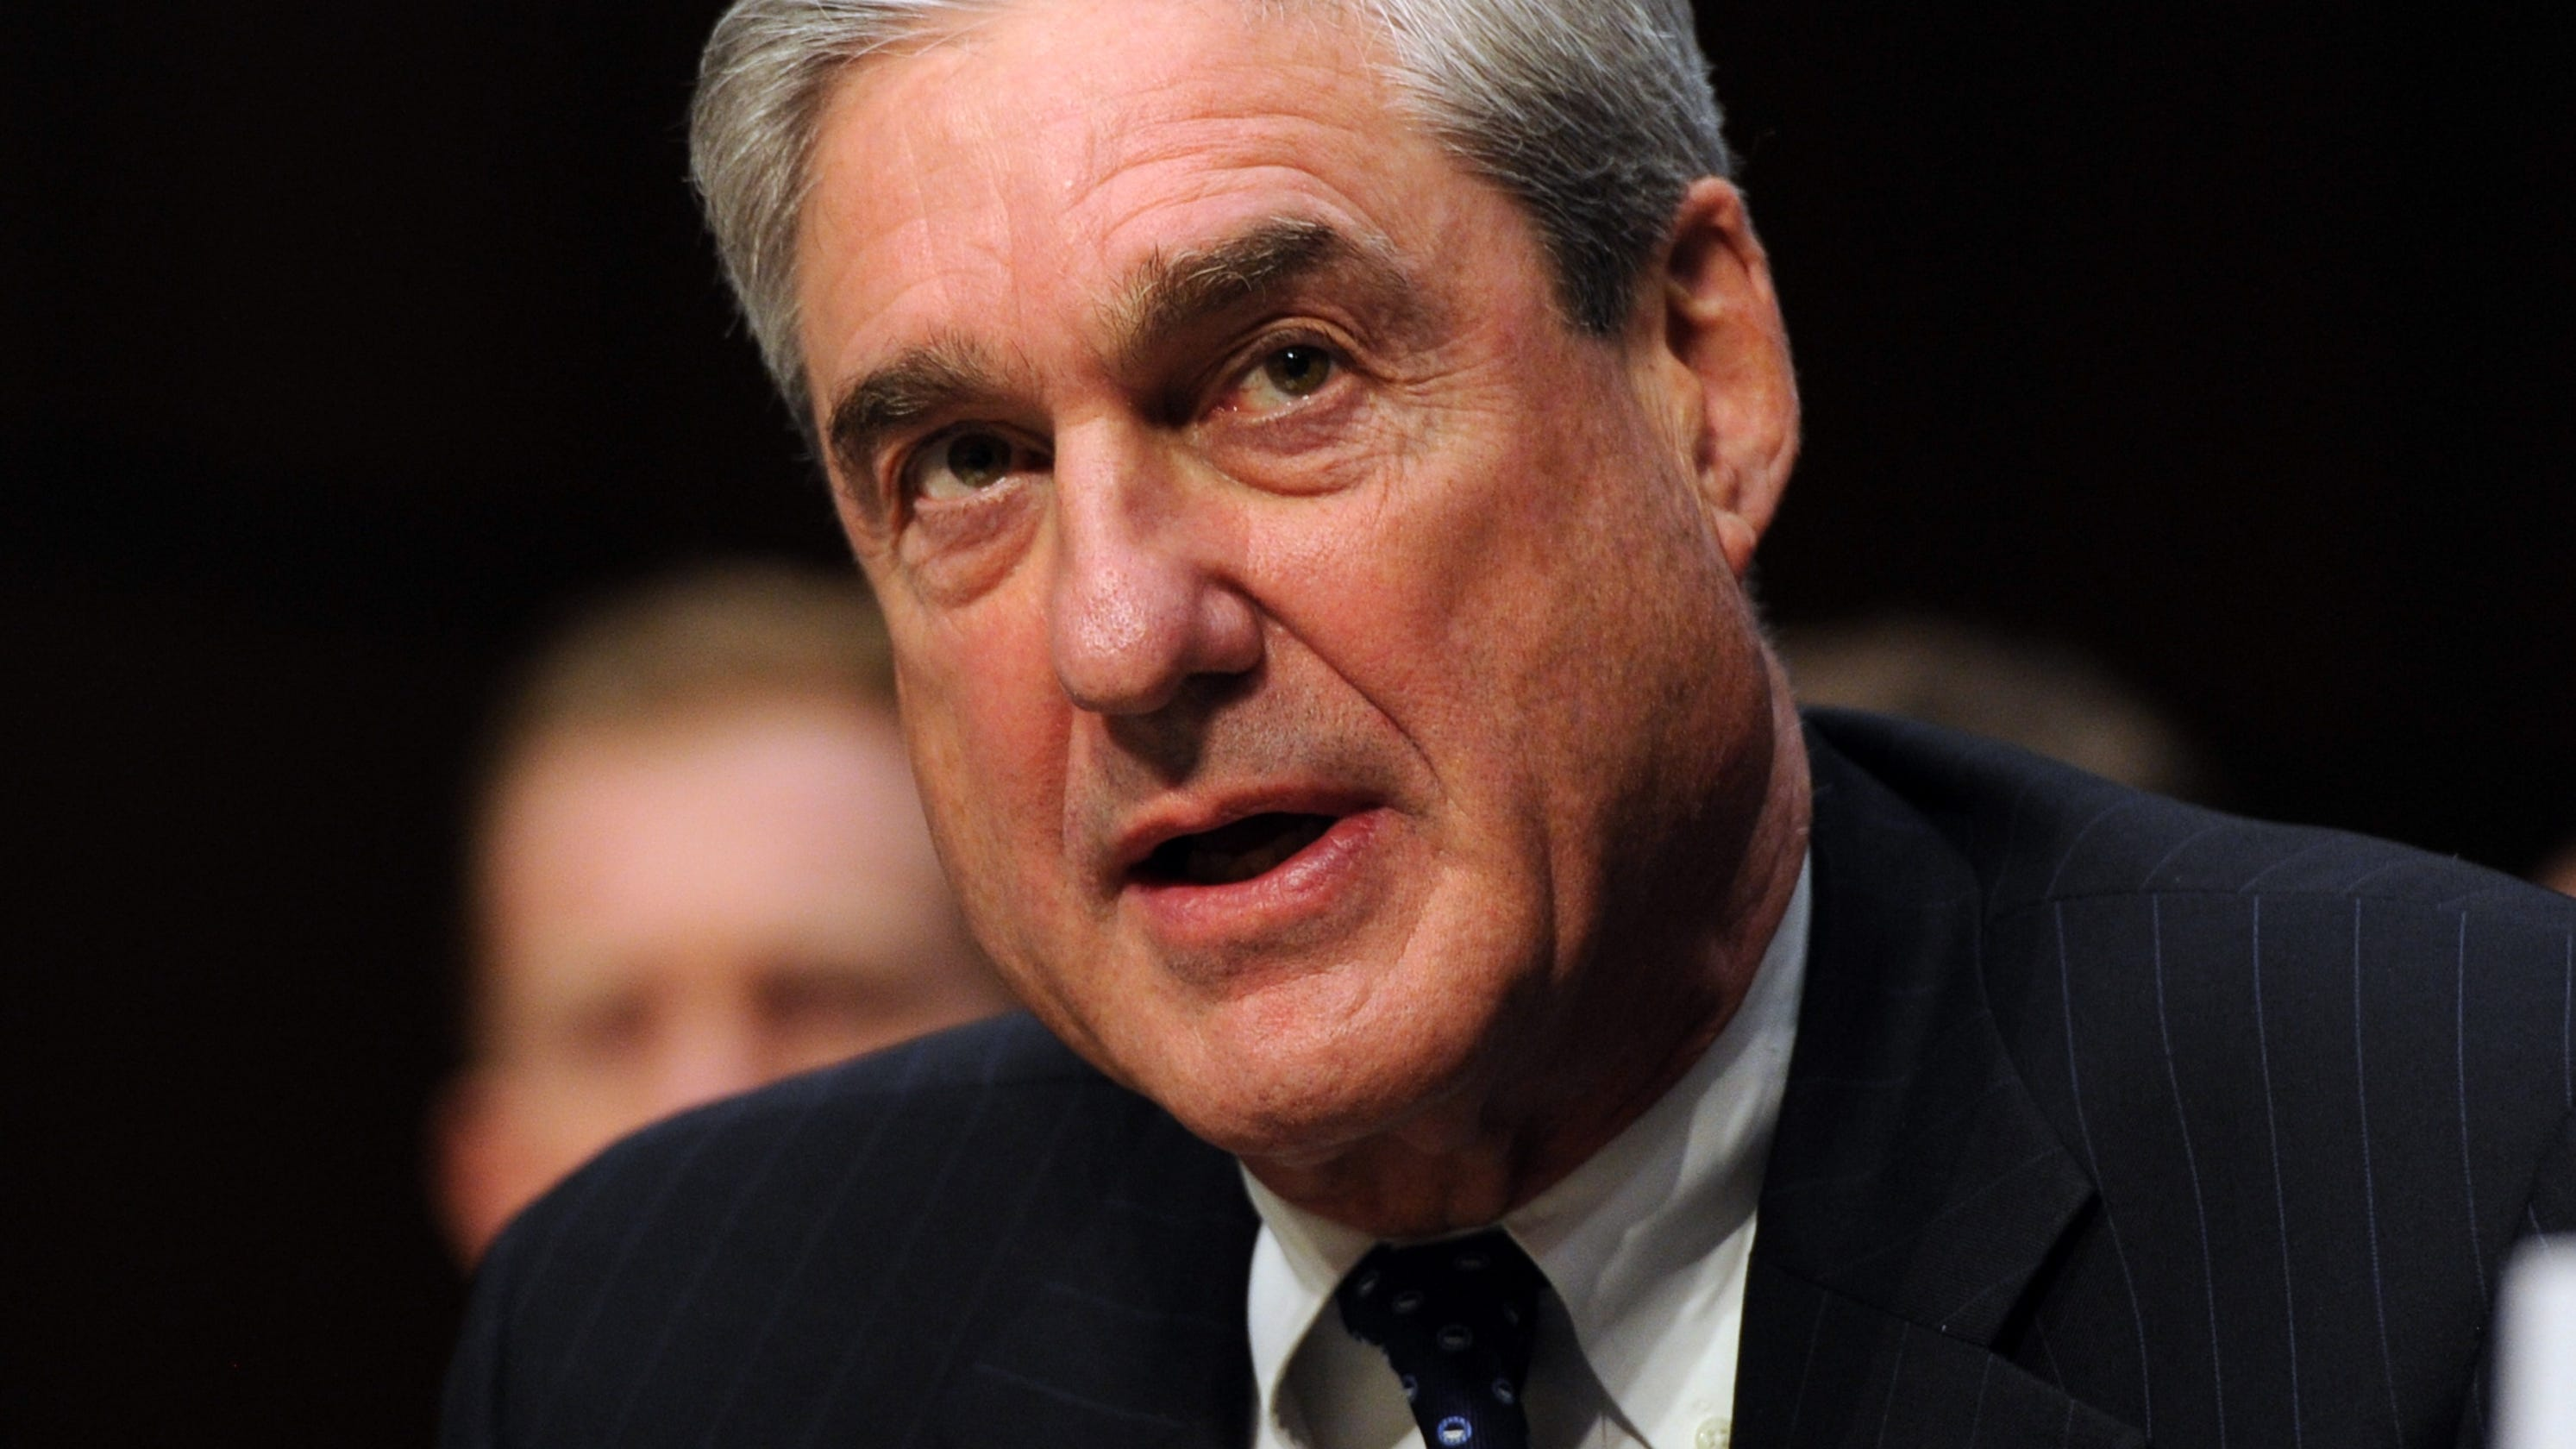 Mueller report: Trump, Russia investigation ends, Barr